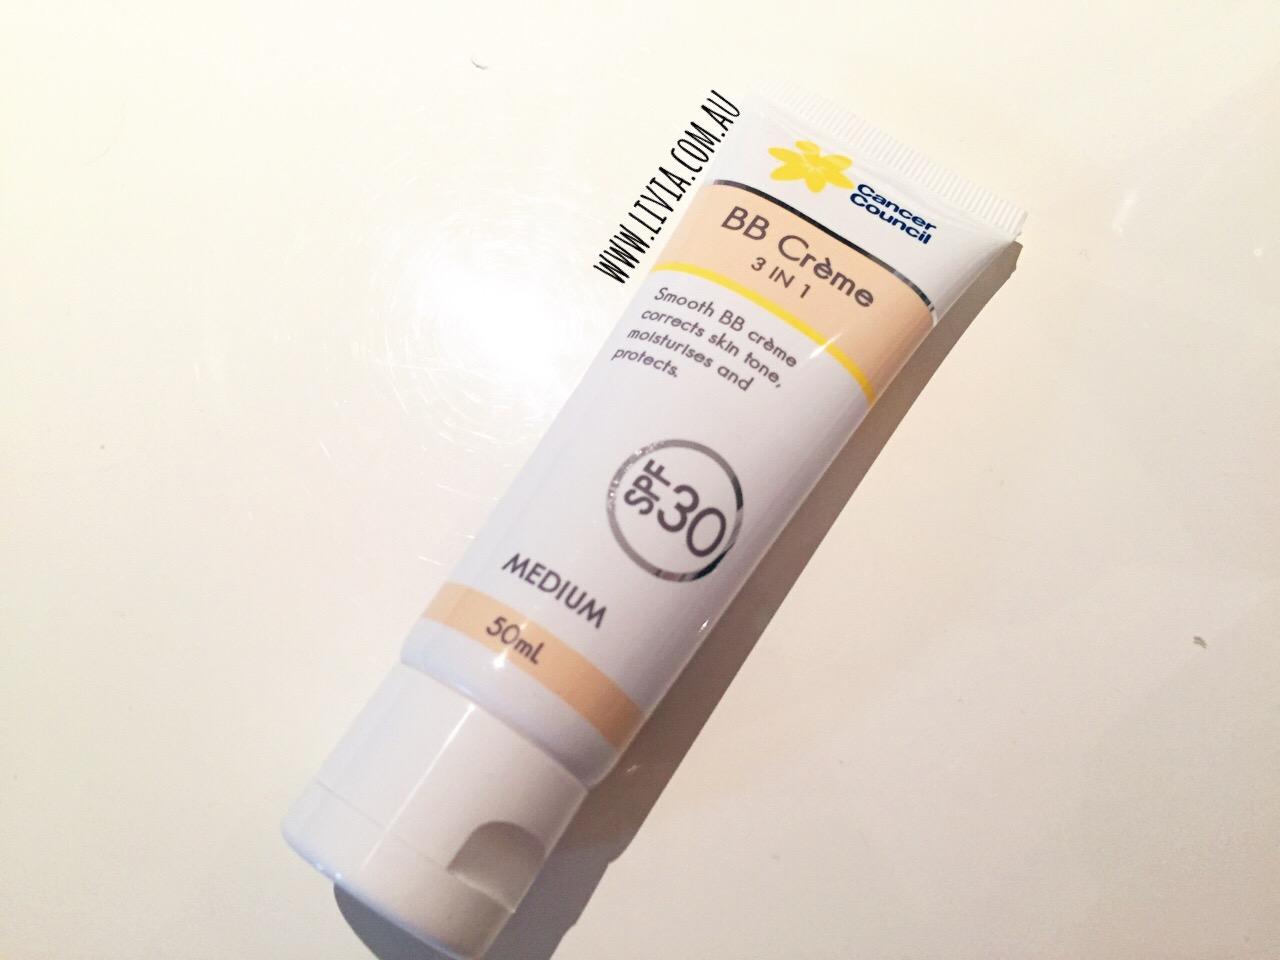 Of I Skin Protectioncoverage V FeatCancer L ATypes Creams Fl31JcTK